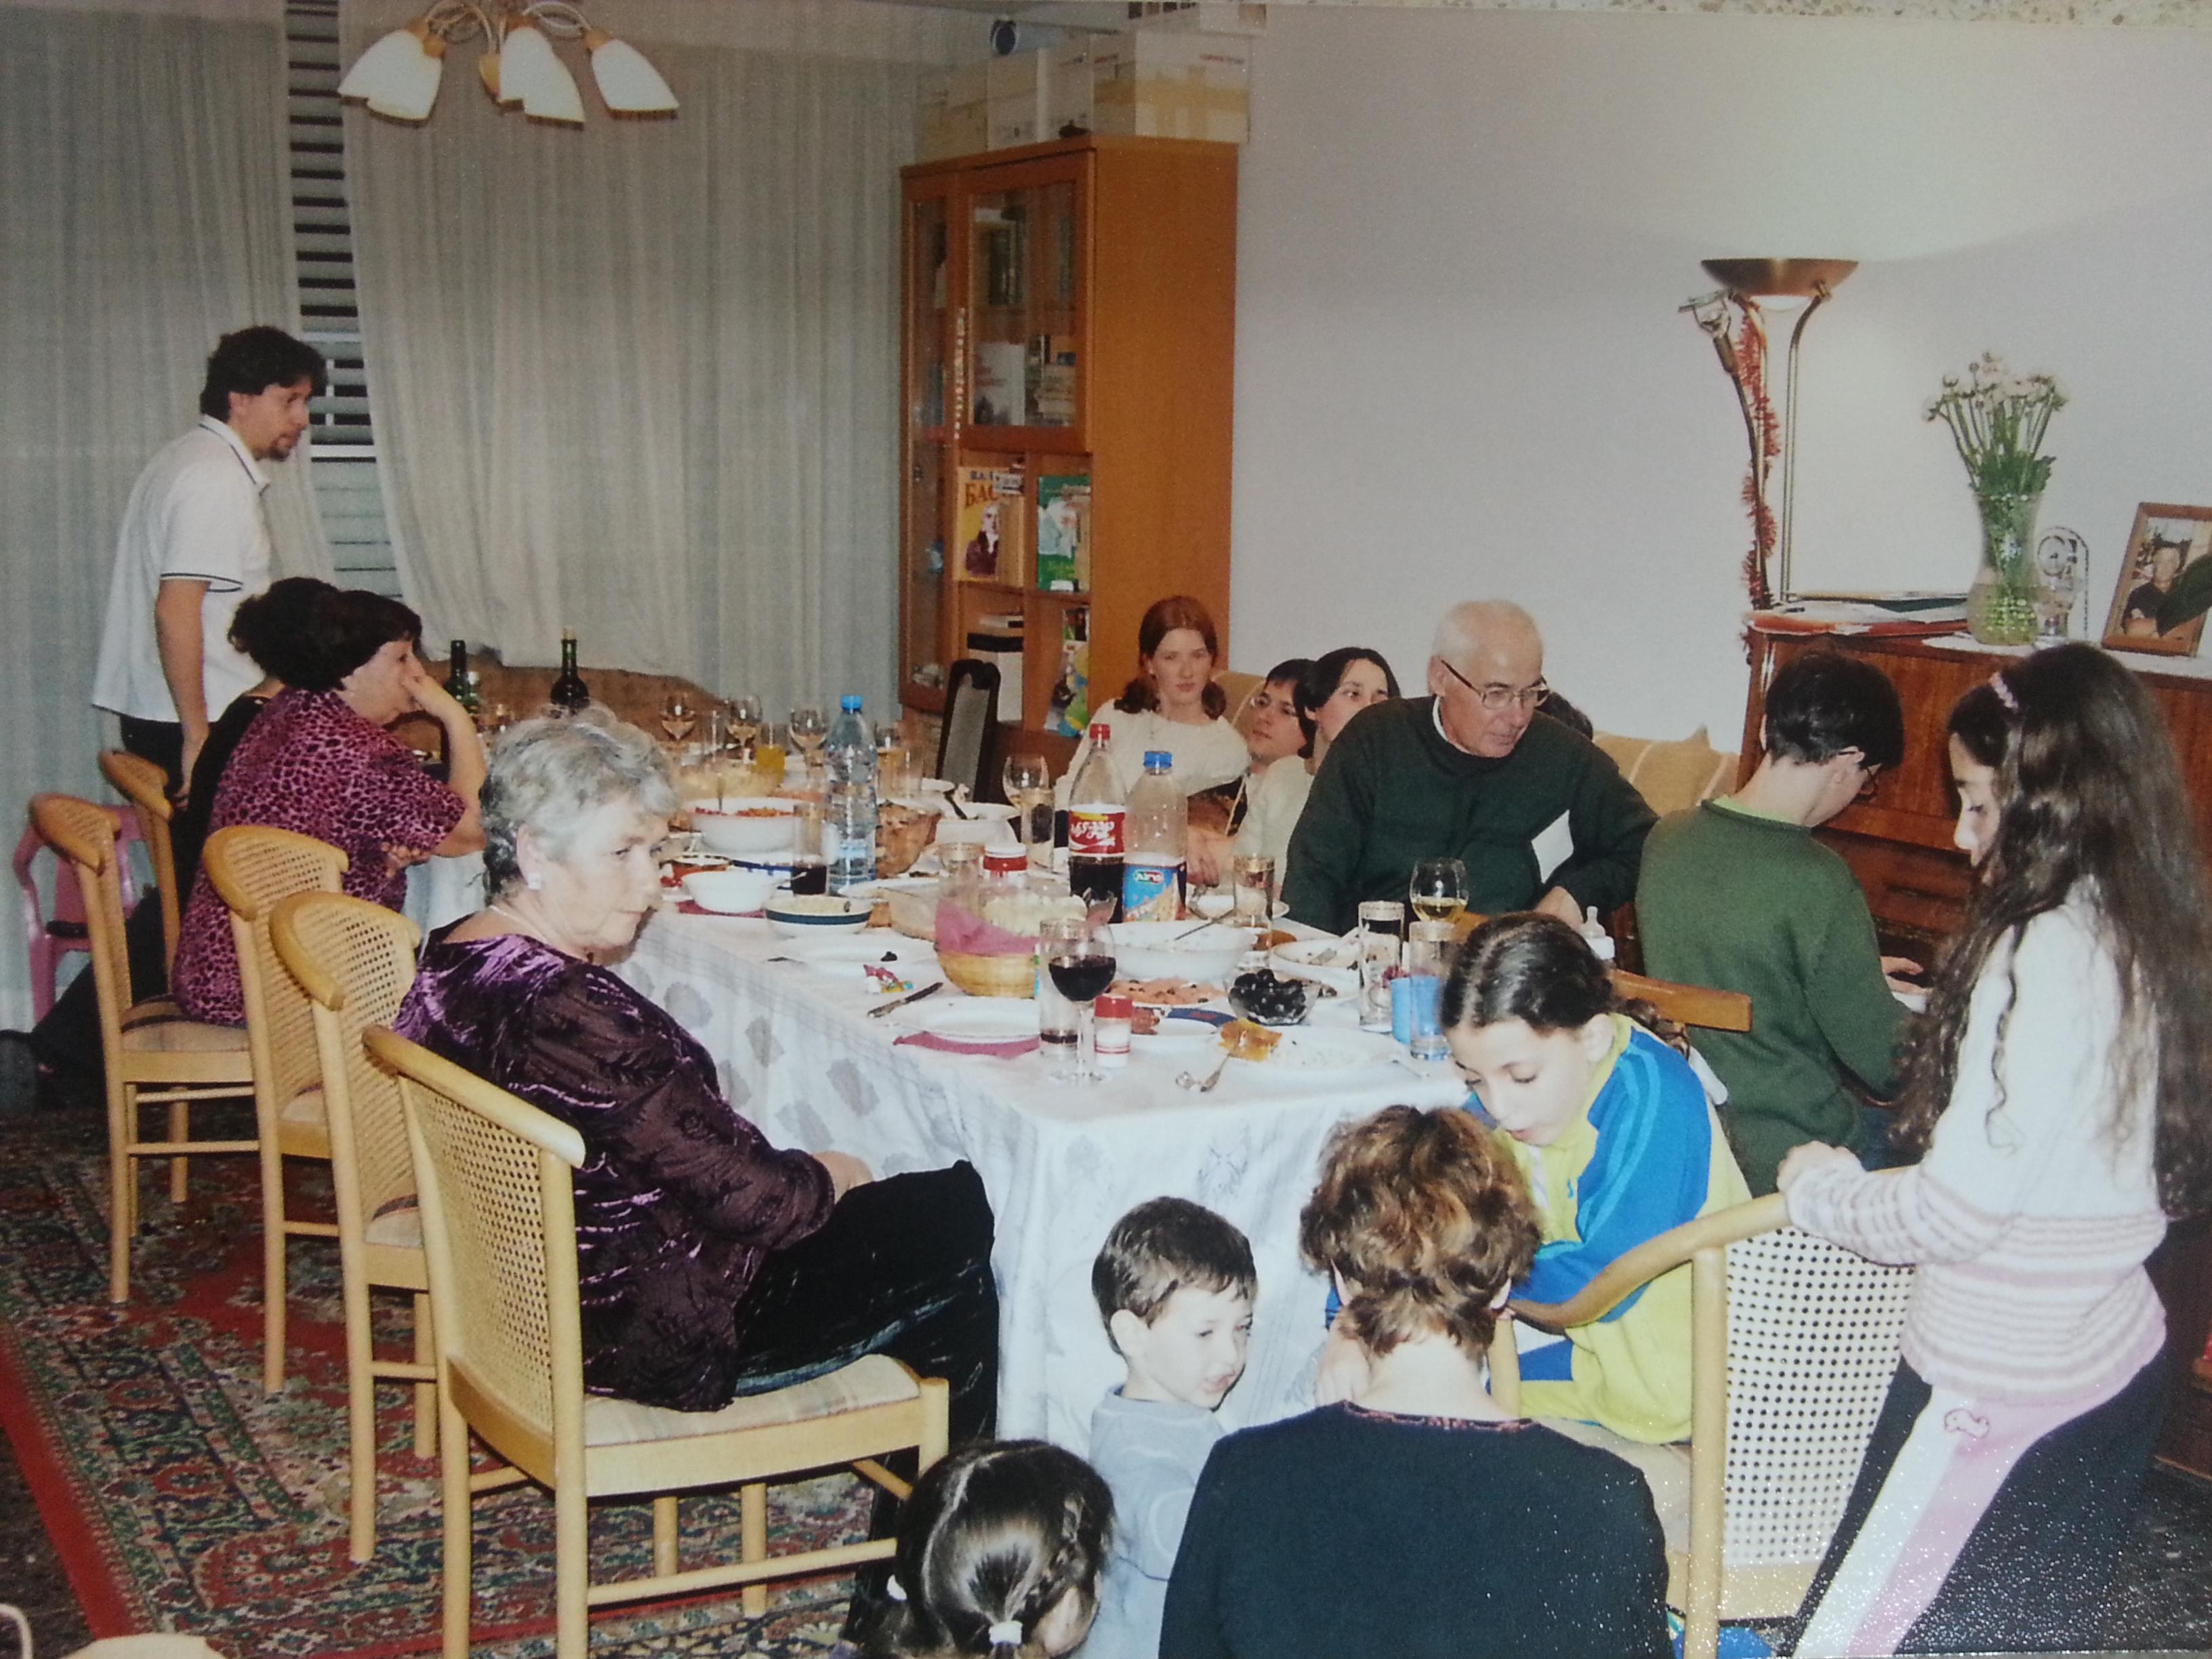 Dan Vershkov, 2006 או 2007, ראשון לציון. בית משפחת ורשקוב(3)